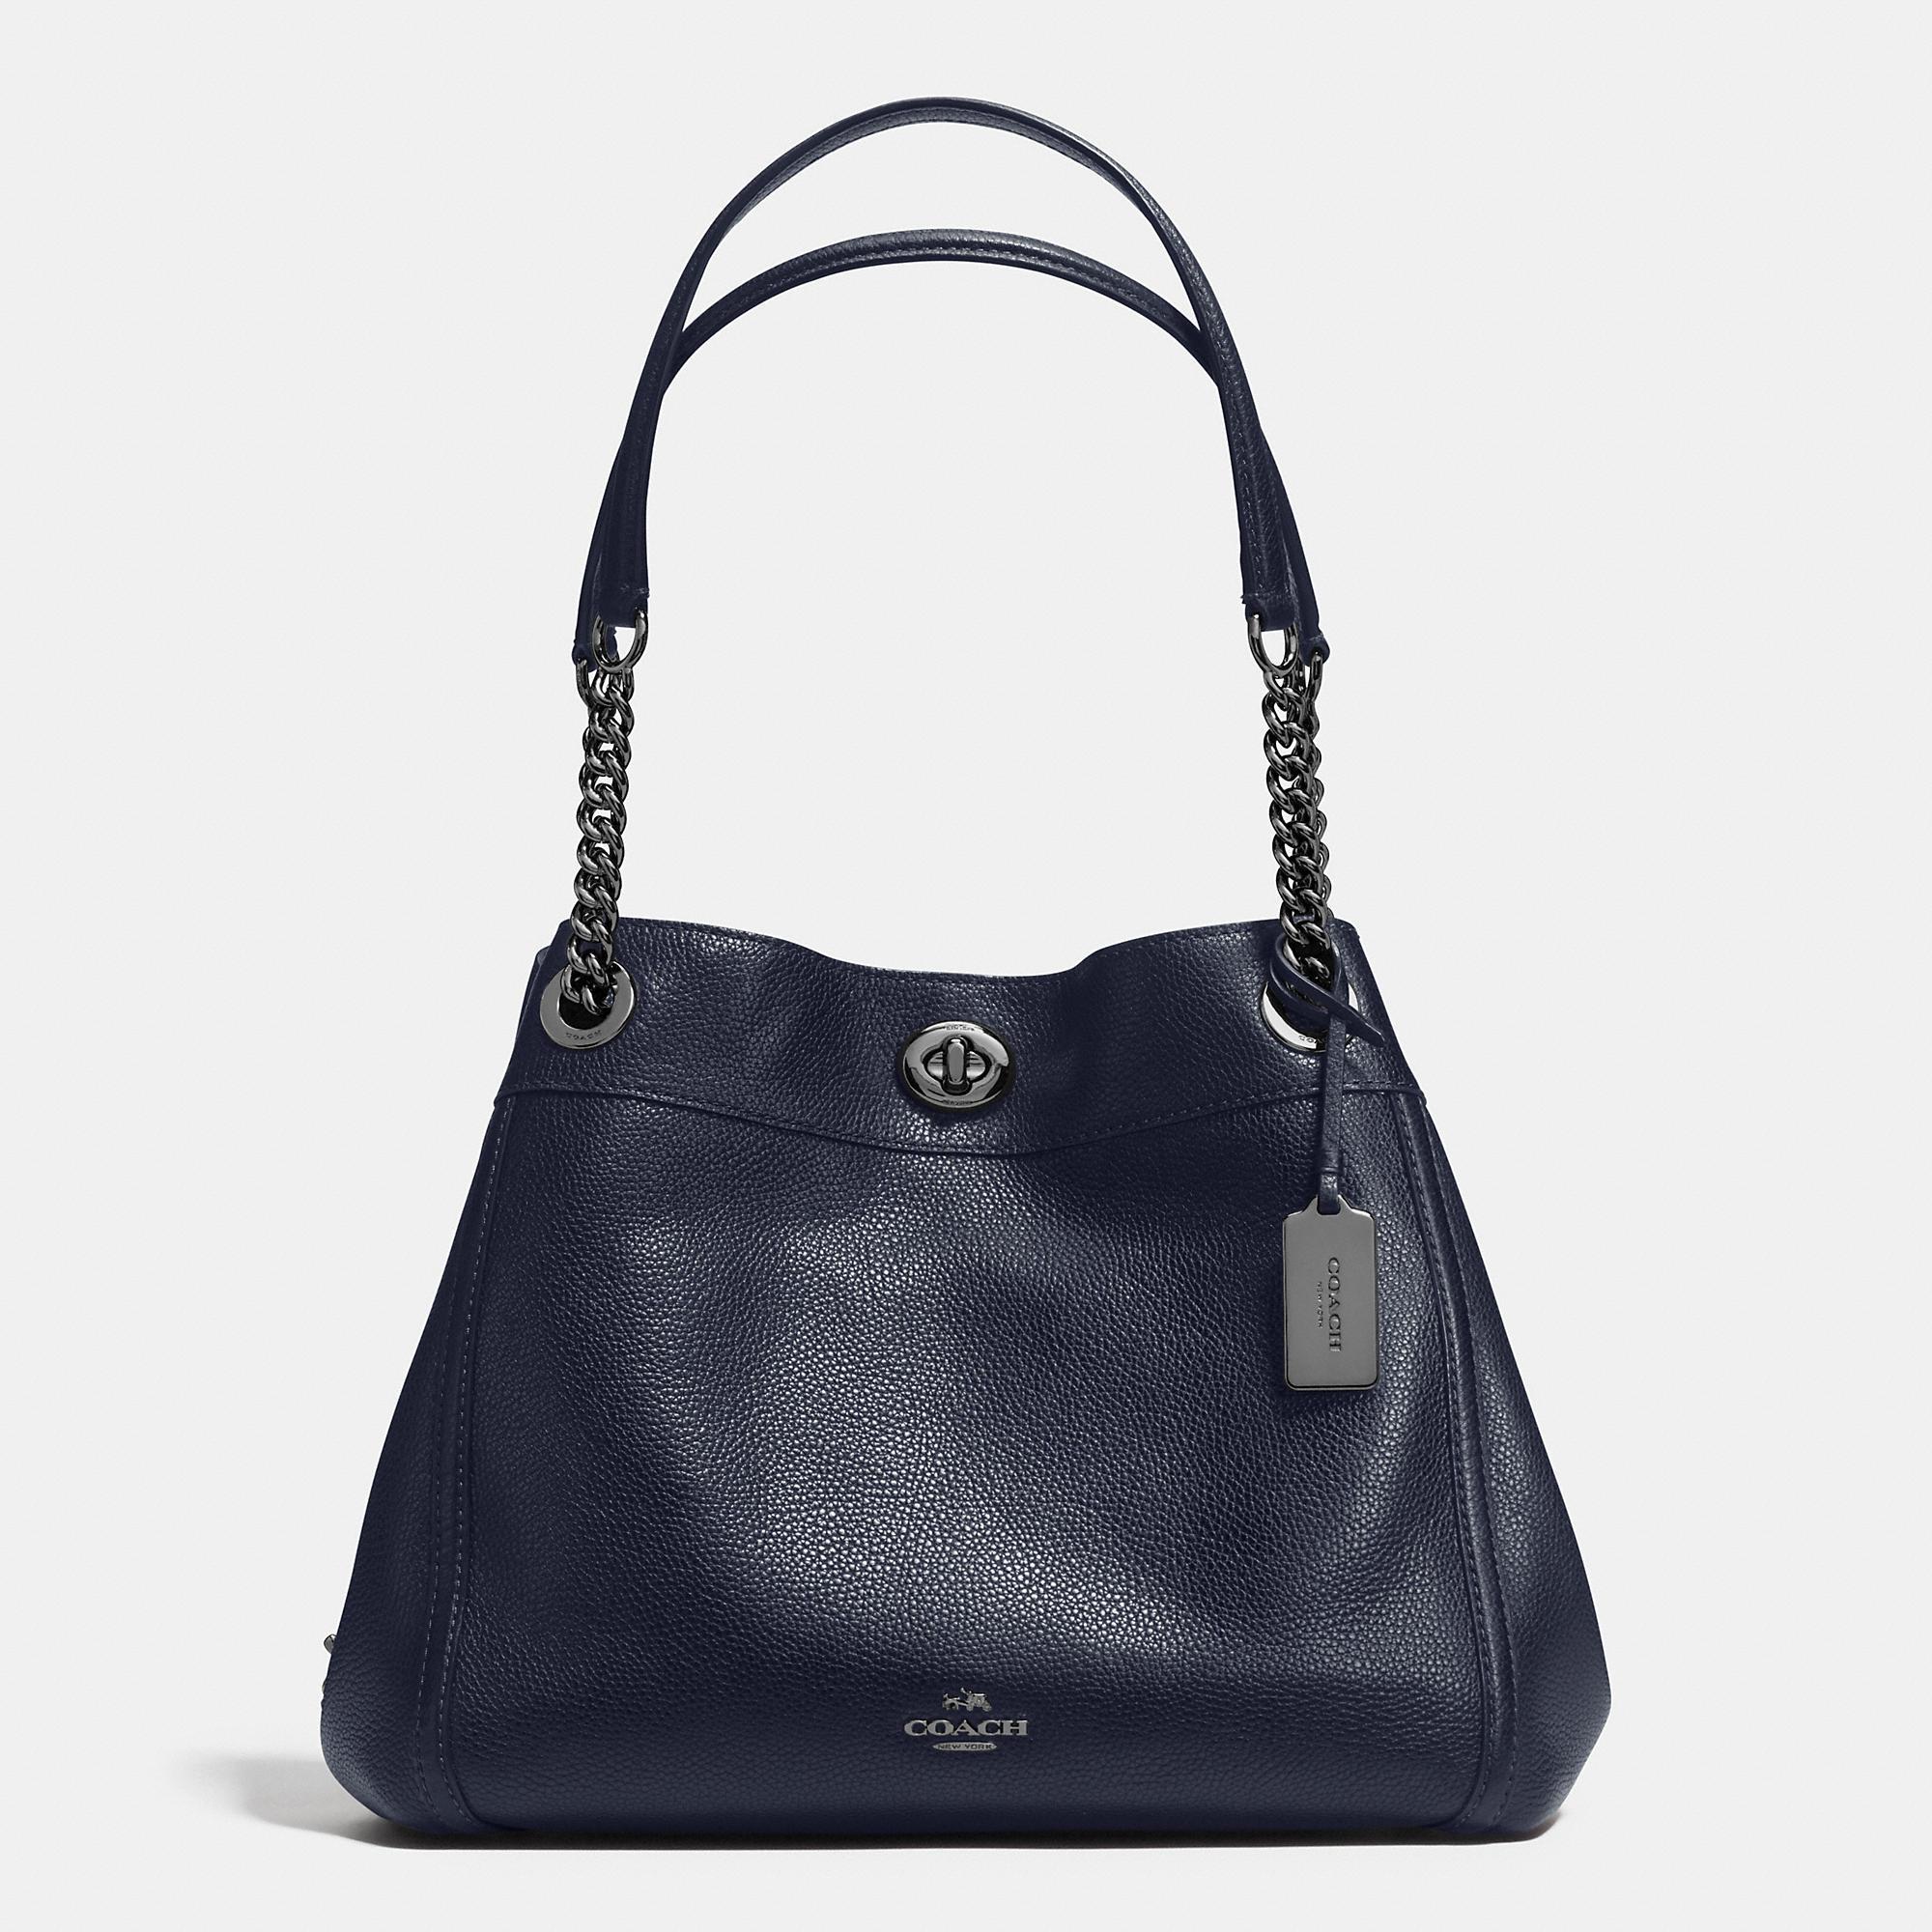 Coach Turnlock Edie Shoulder Bag In Polished Pebble Leather in ...